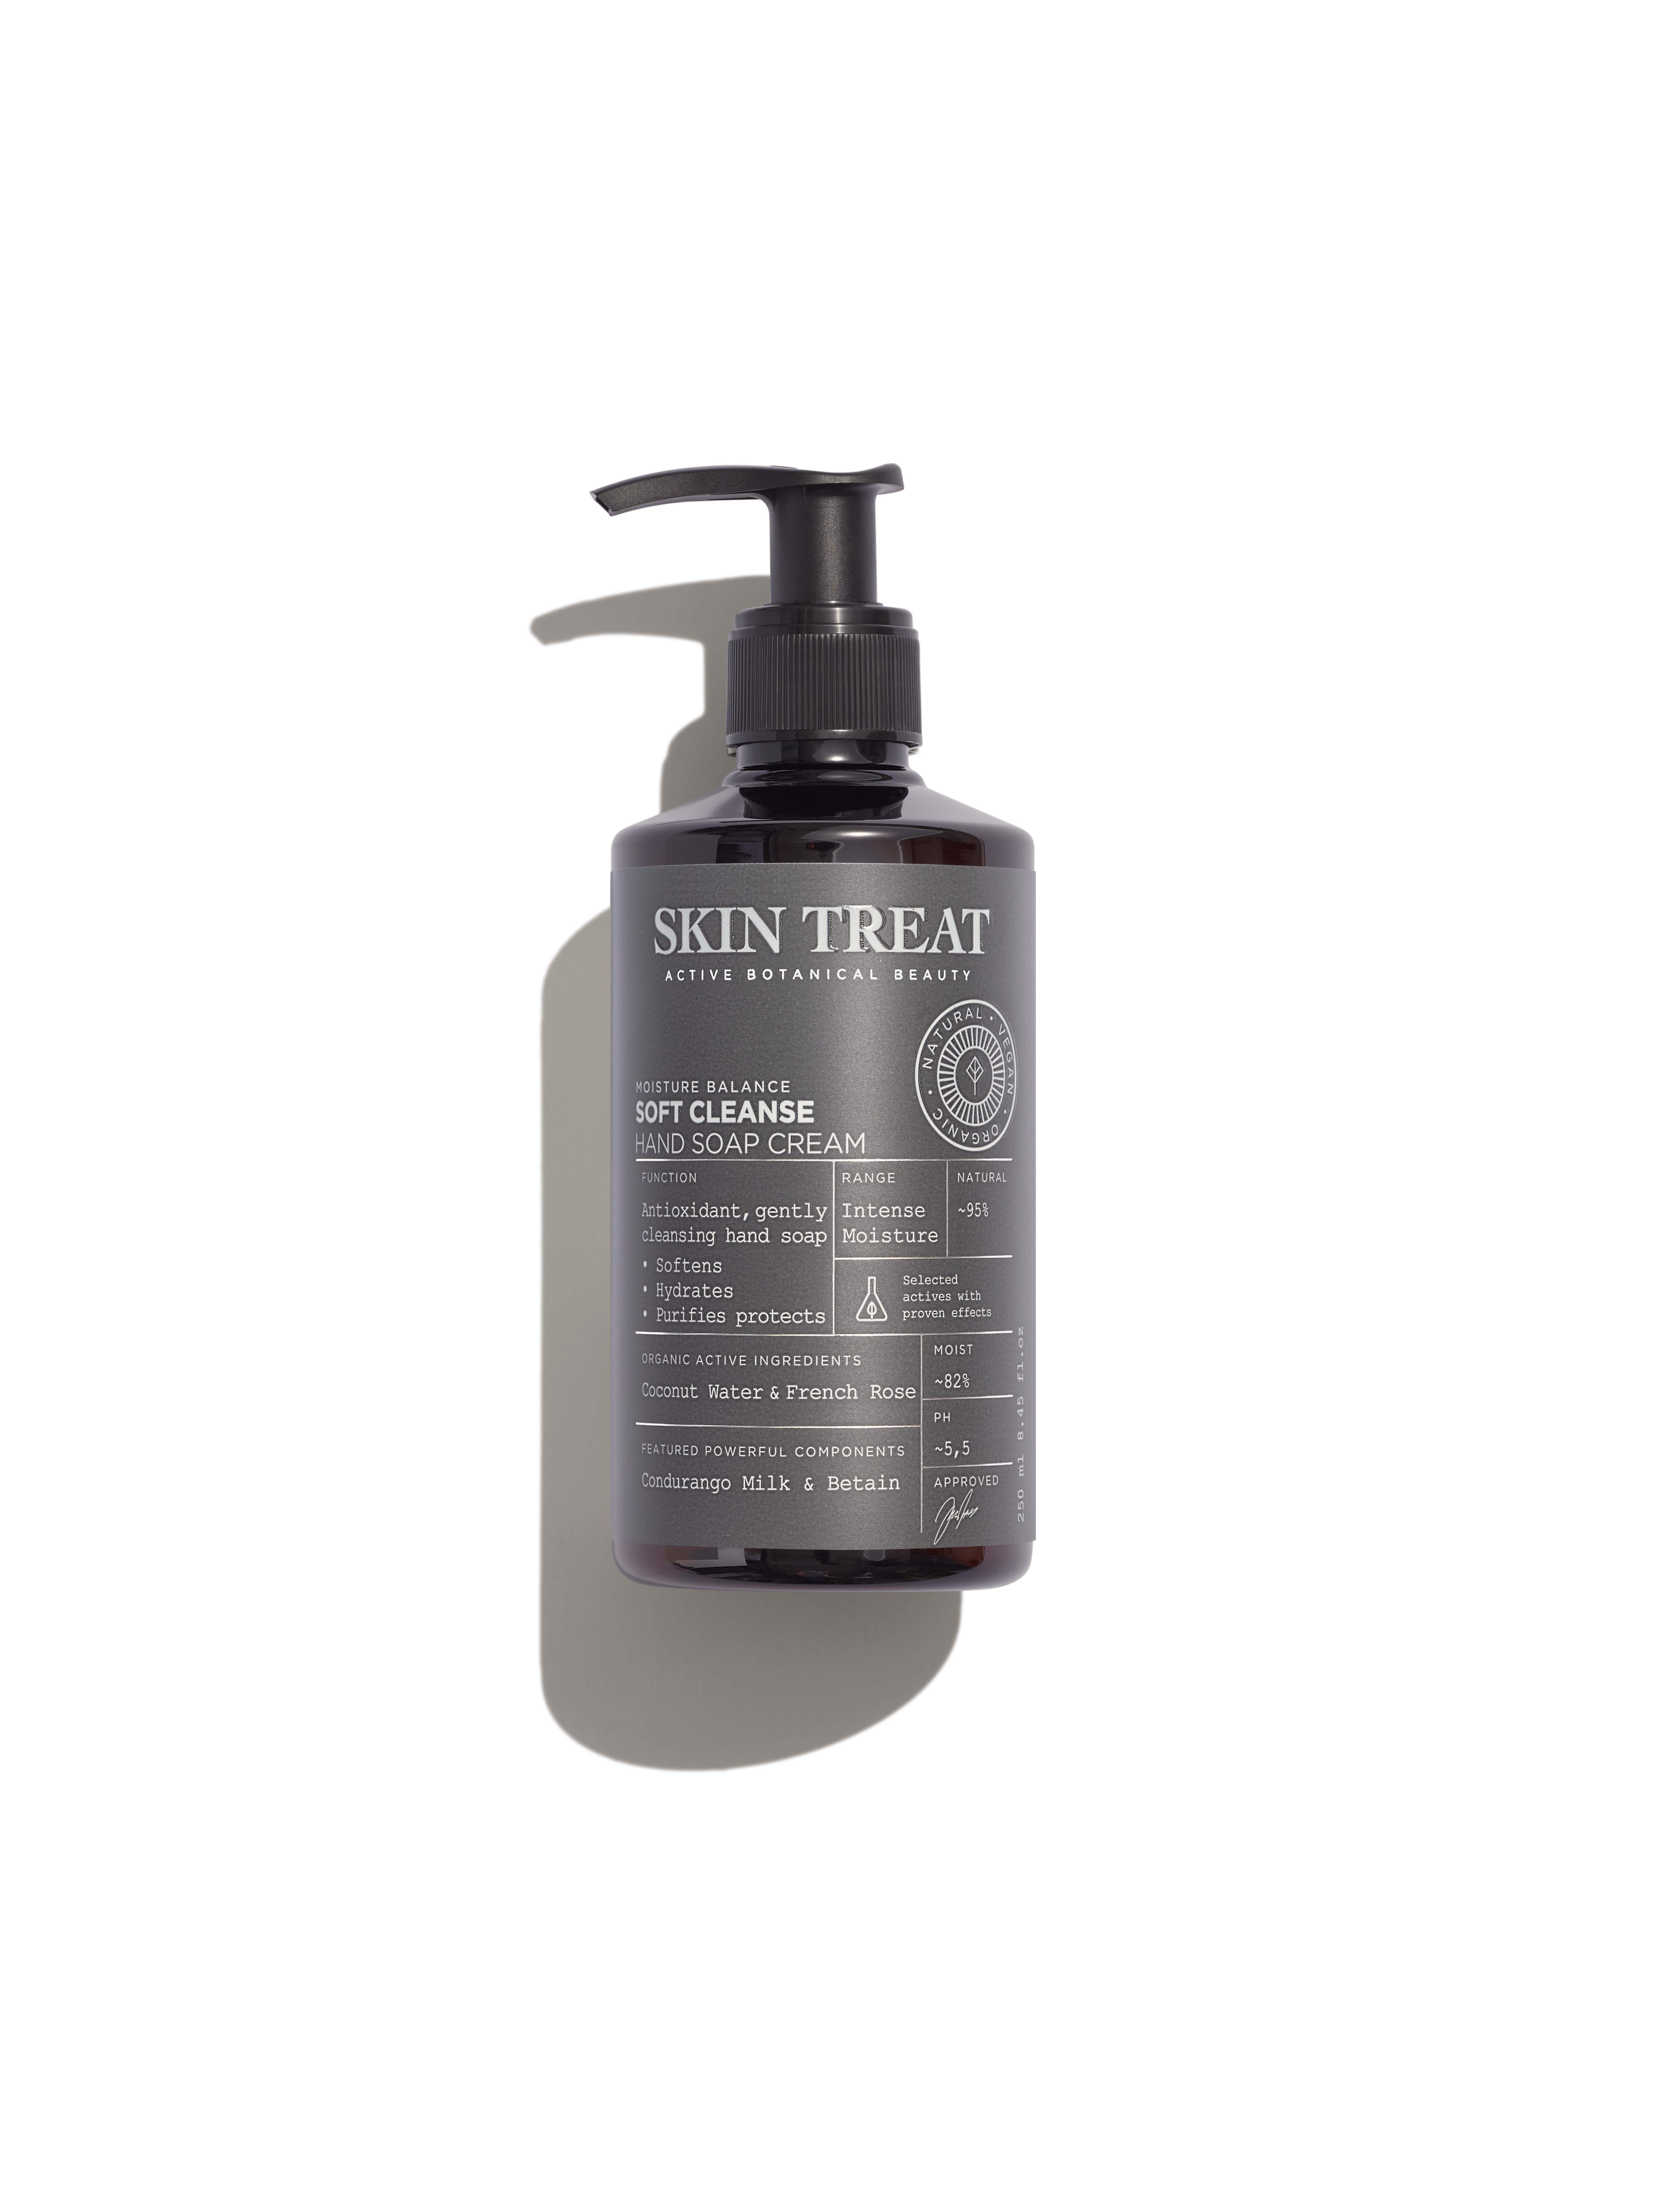 Soft Cleanse Hand Soap Cream